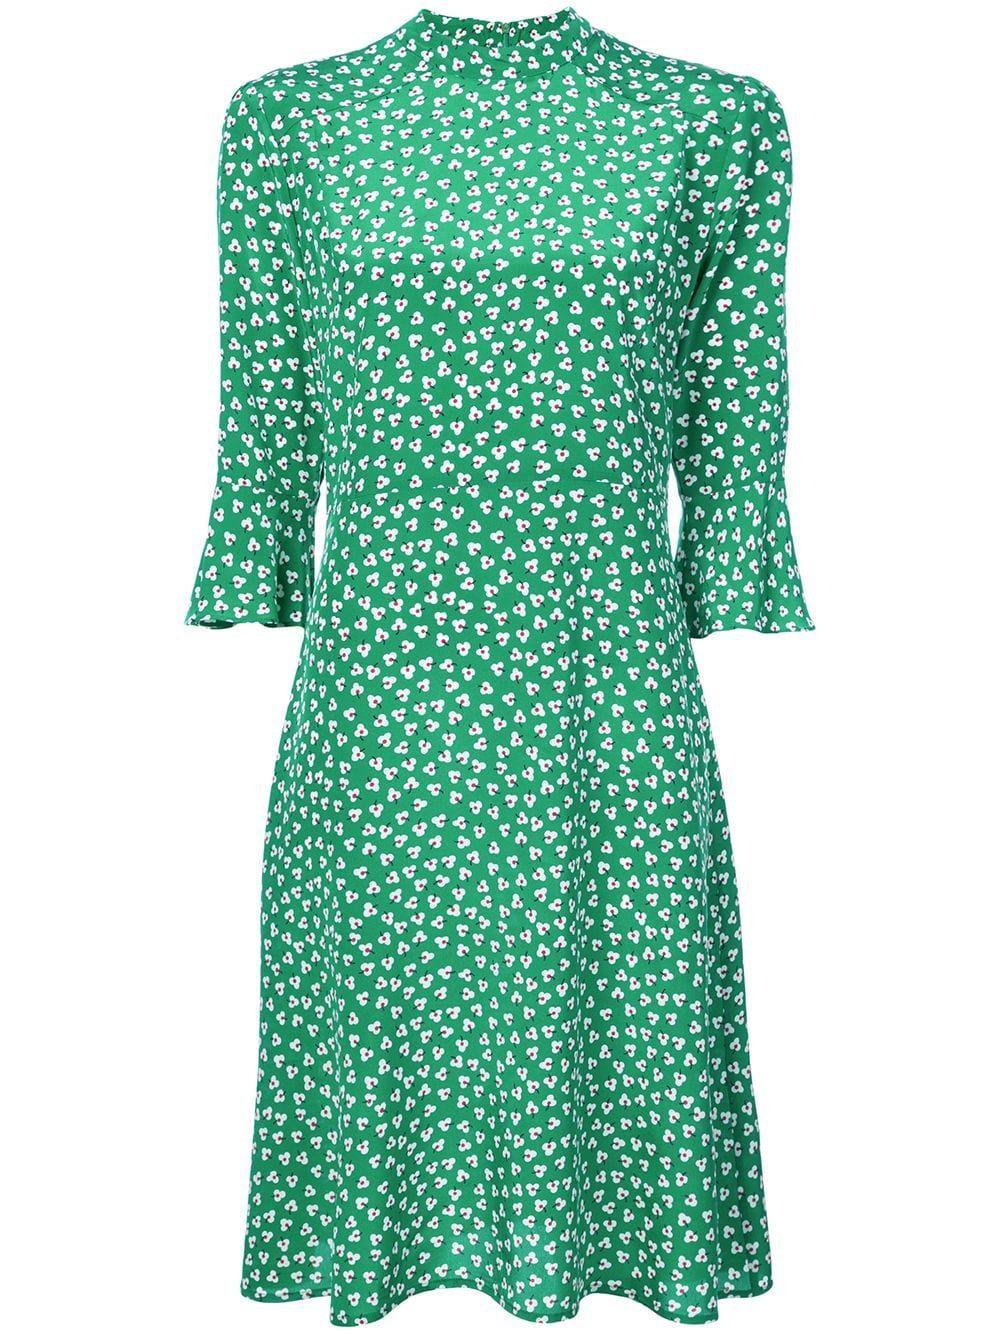 af971b882b5d7 HARLEY VIERA-NEWTON HARLEY VIERA NEWTON PRINTED DAY DRESS - GREEN.  #harleyviera-newton #cloth